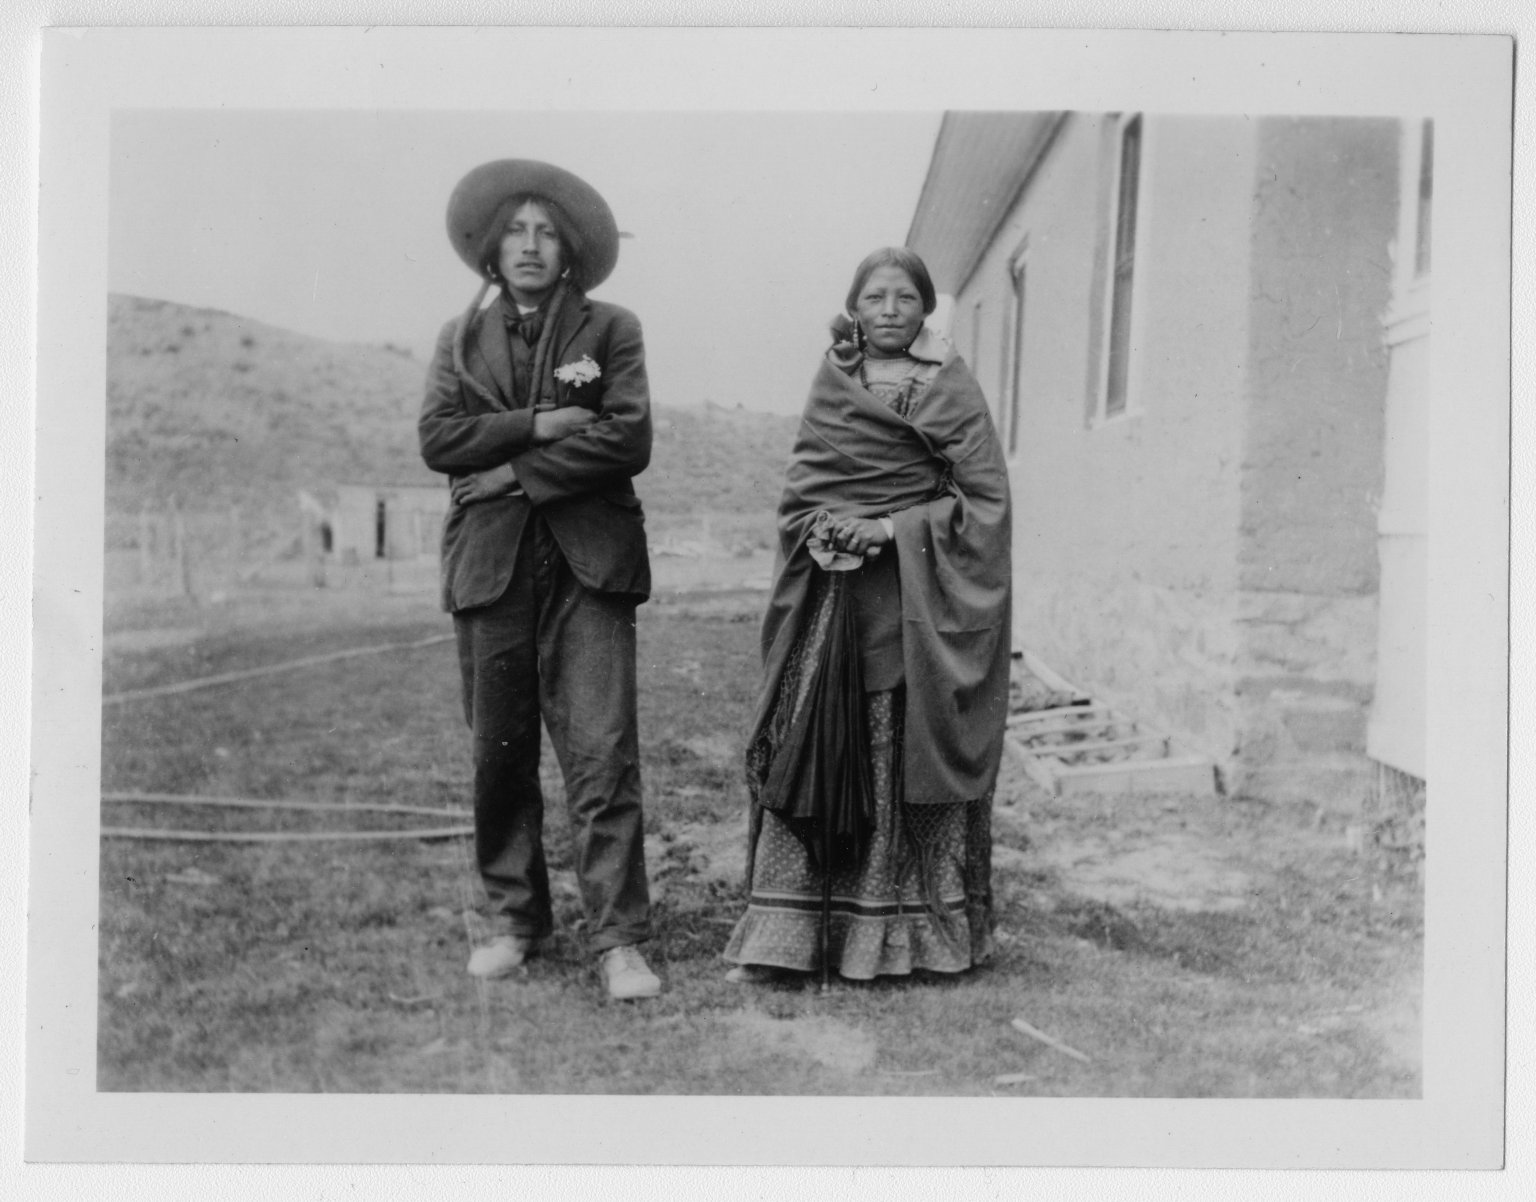 Mr. and Mrs. Cevero Caramilla